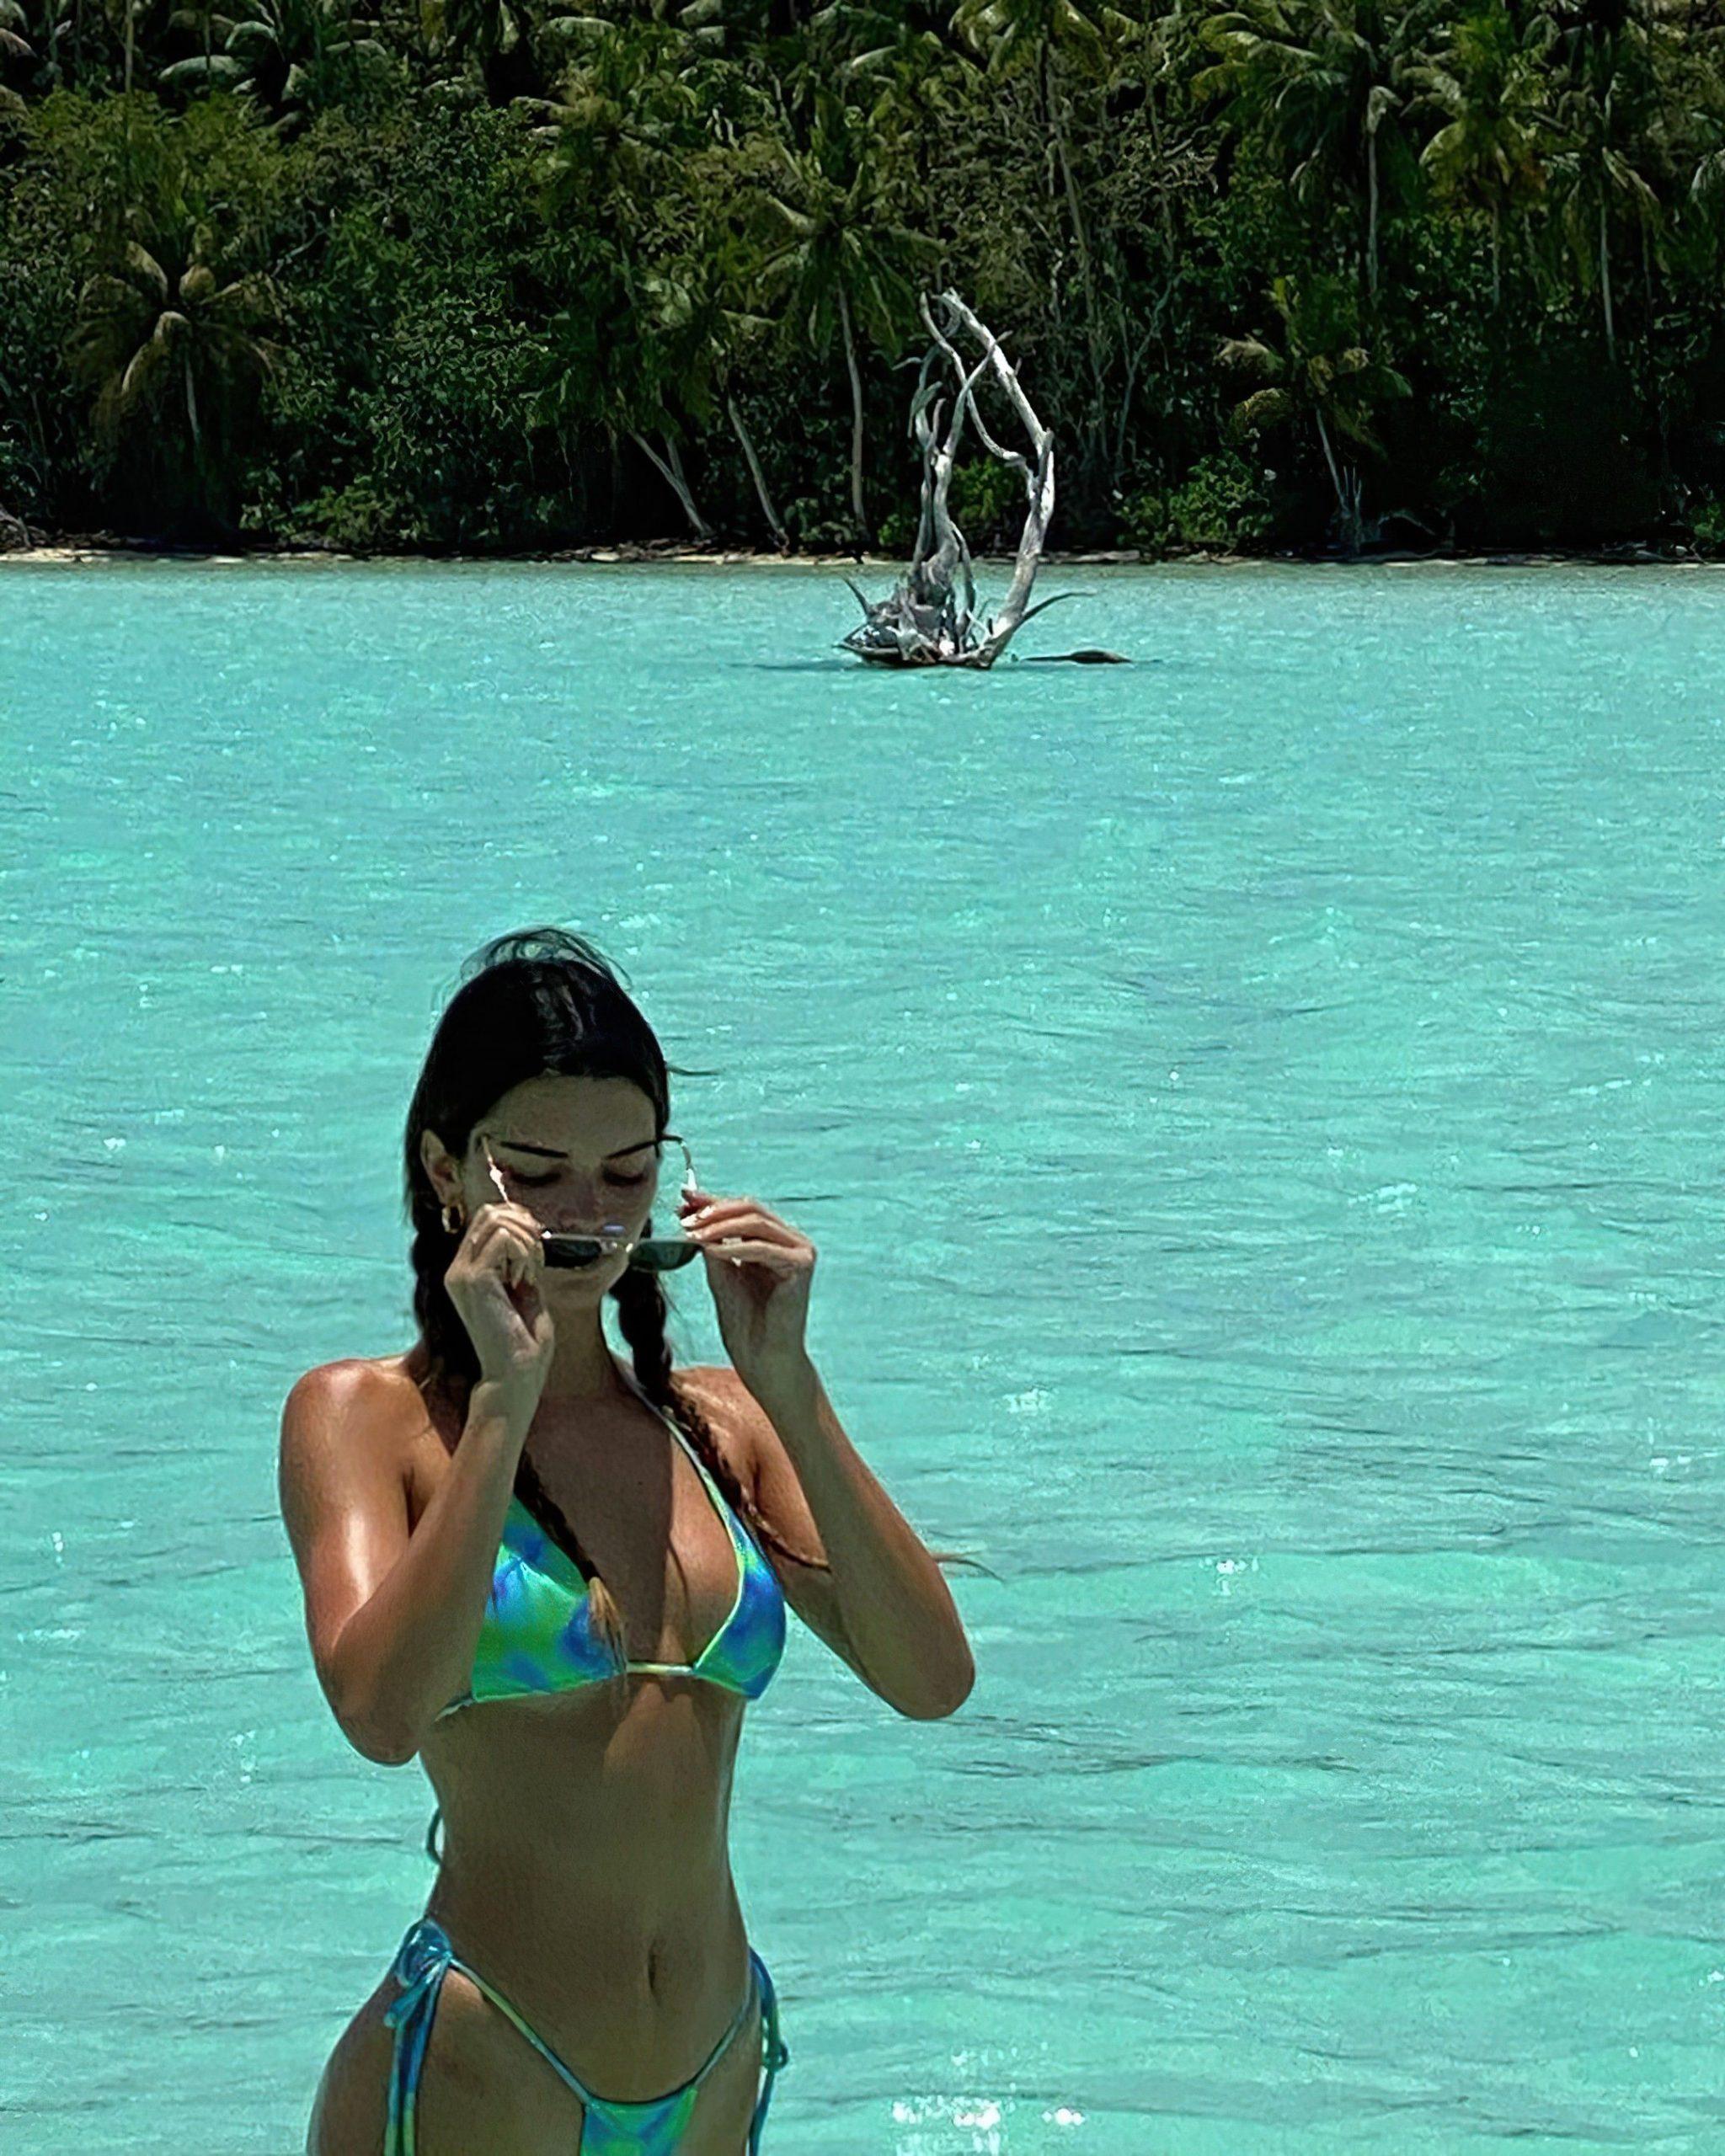 Kendall Jenner Nude Beach Run photo 8